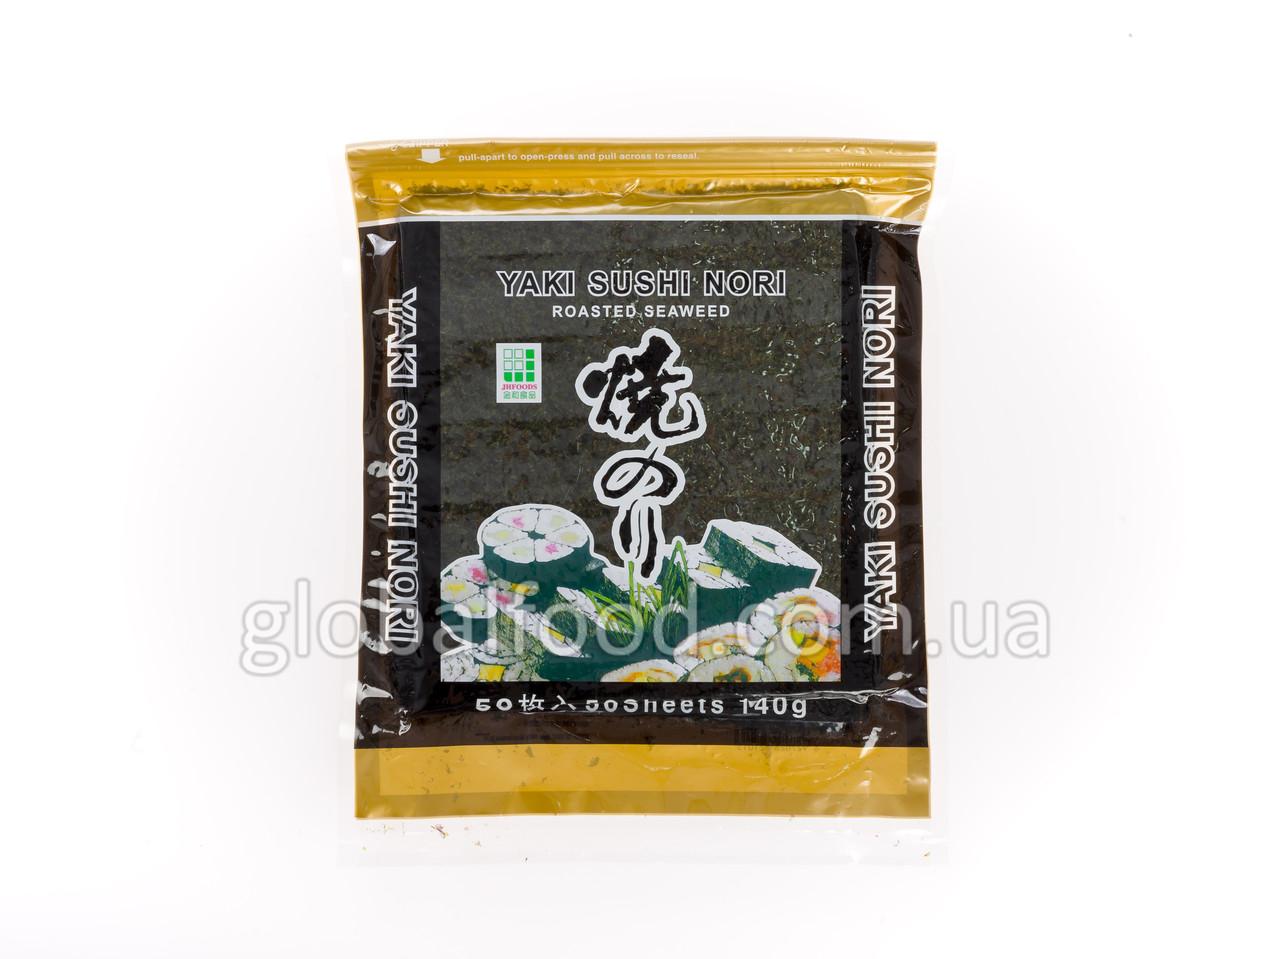 Водоросли Нори Yaki Sushi Nori Gold (50 листов)